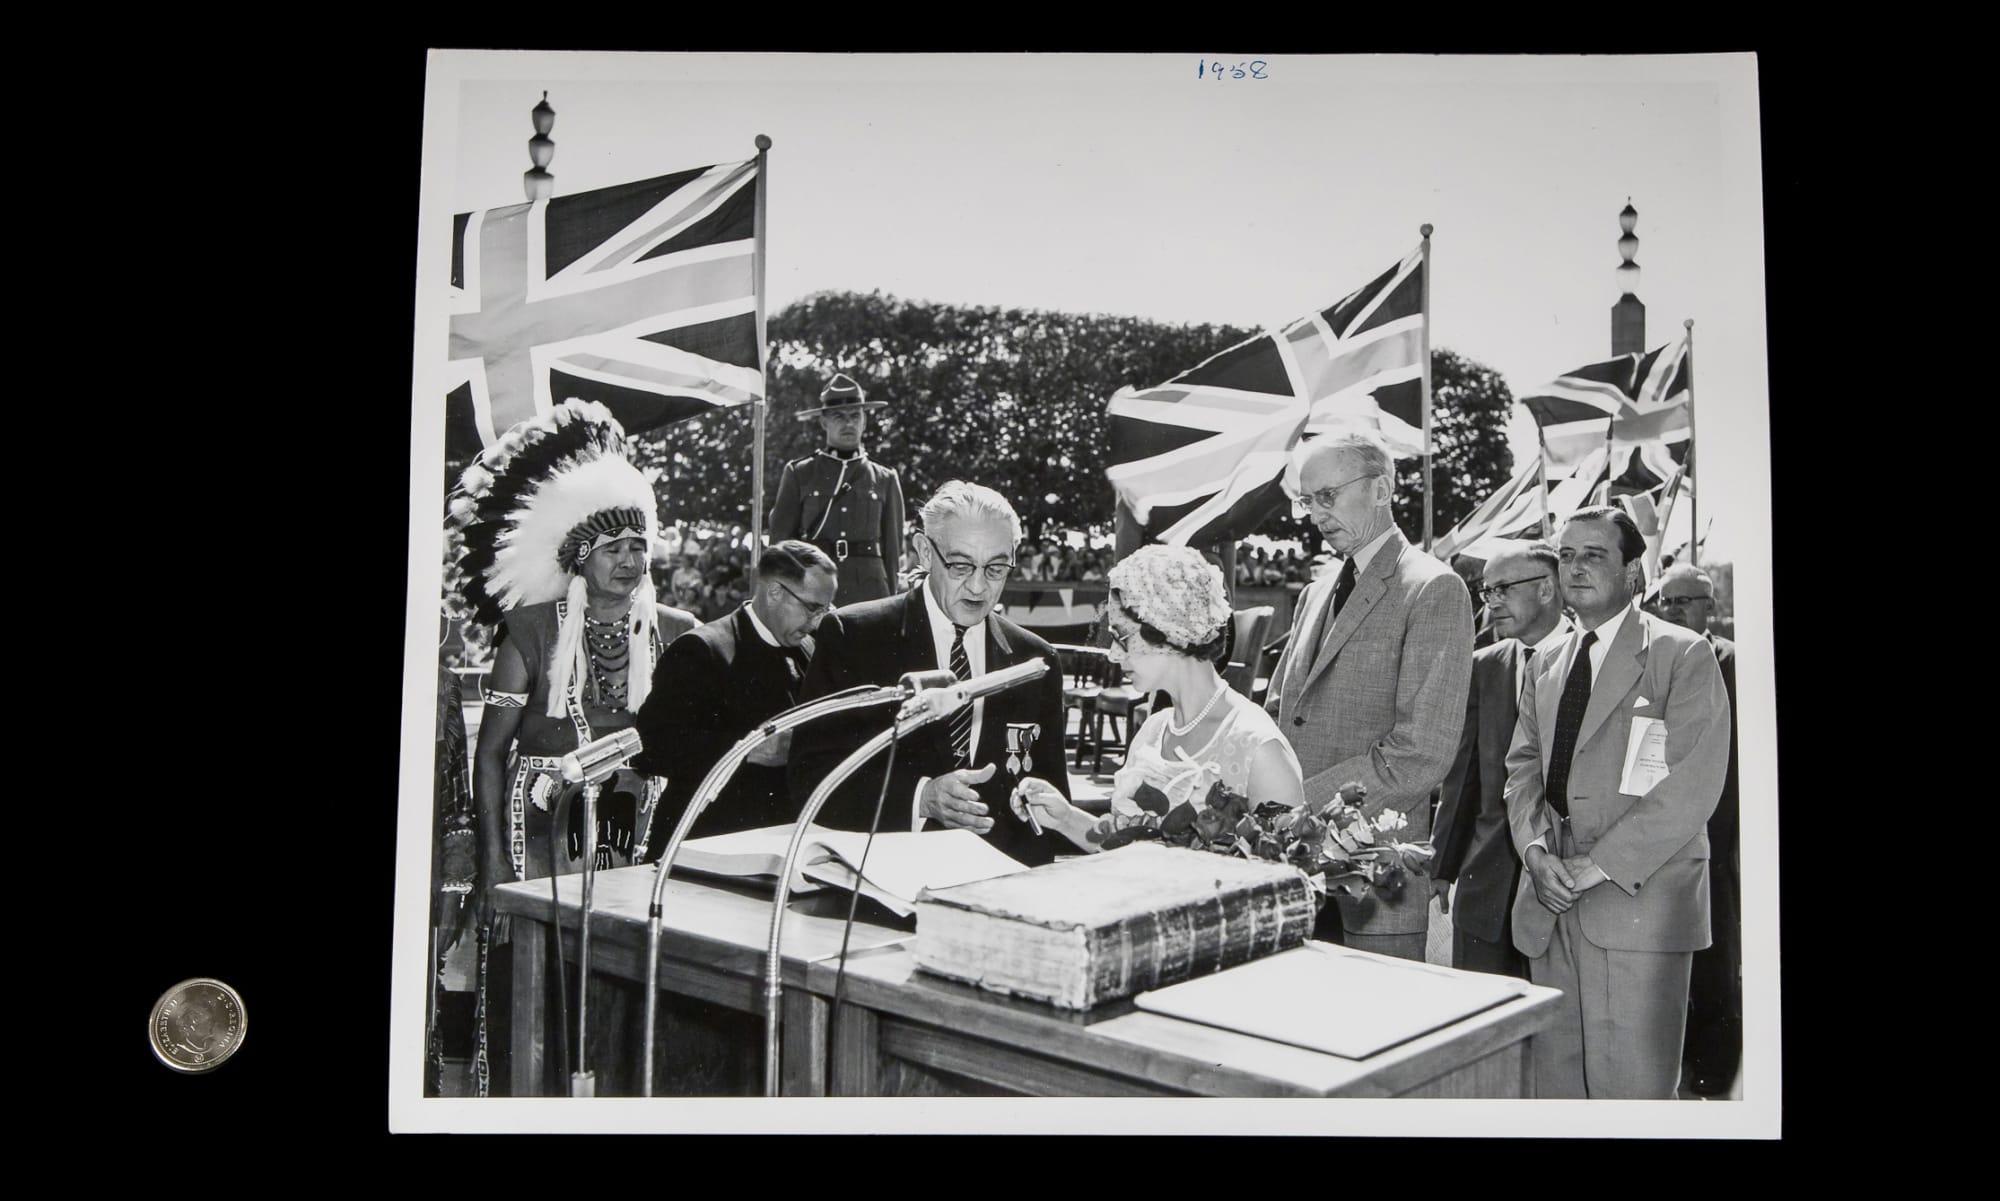 Princess Margaret signing a guest book in Niagara Falls